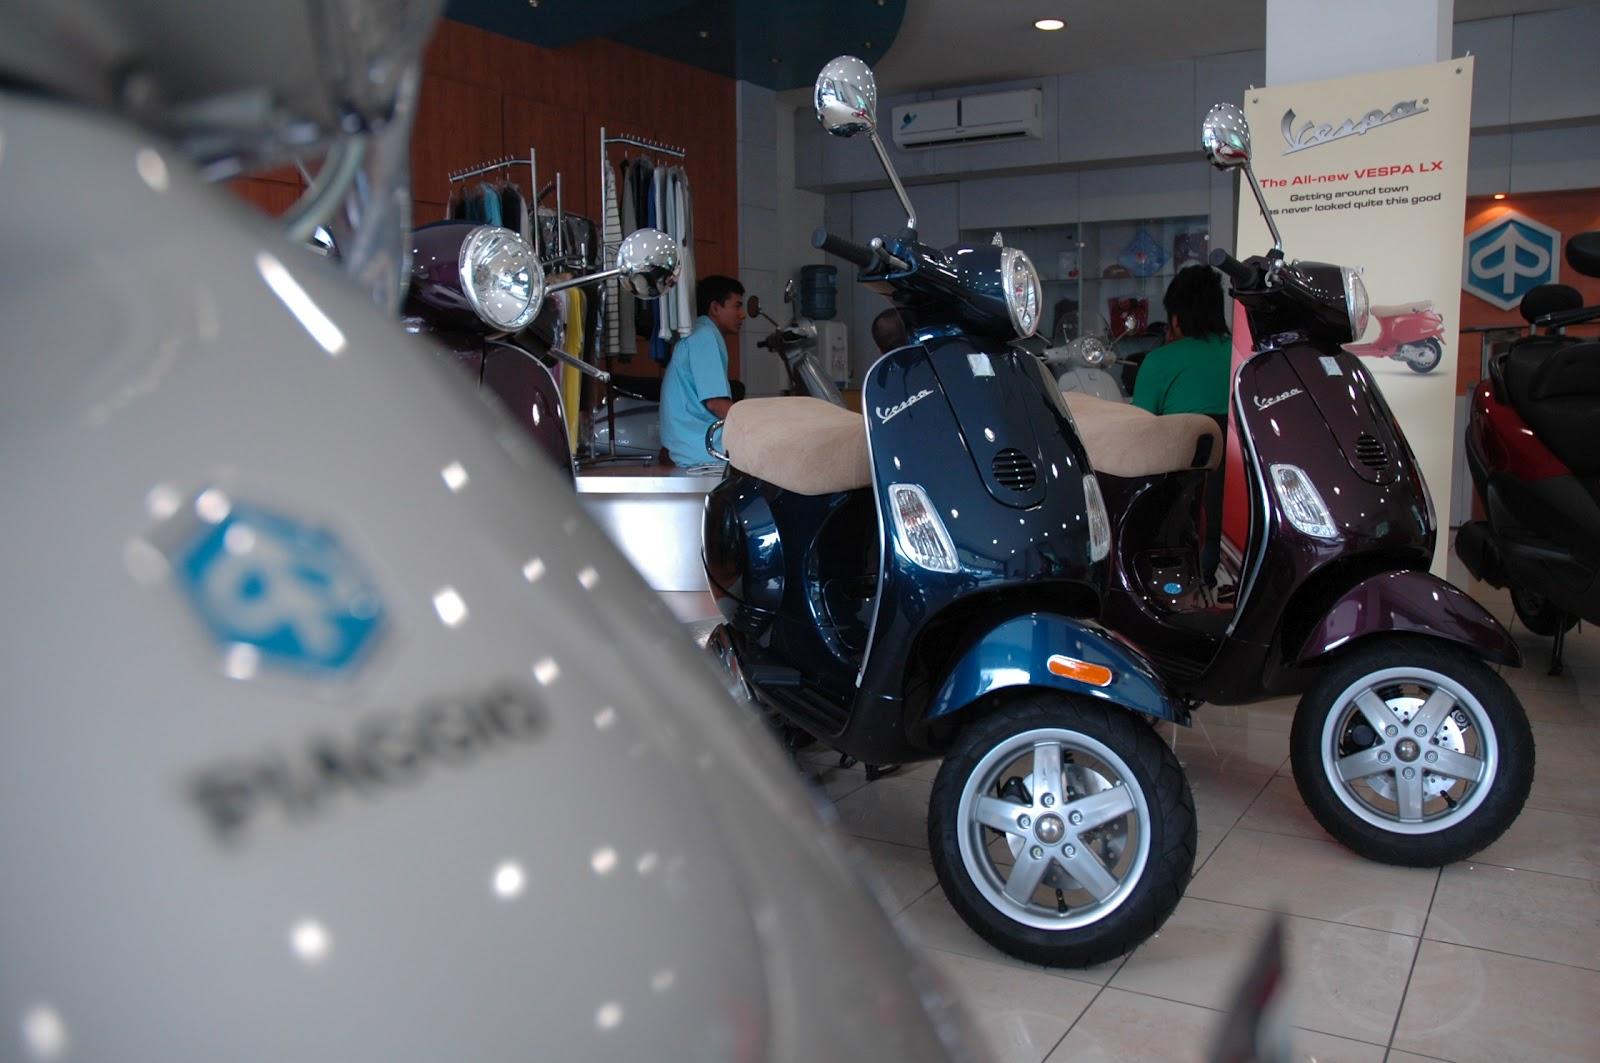 Piaggio vespa surabaya piaggio vespa motor scooter for Motor scooter dealers near me